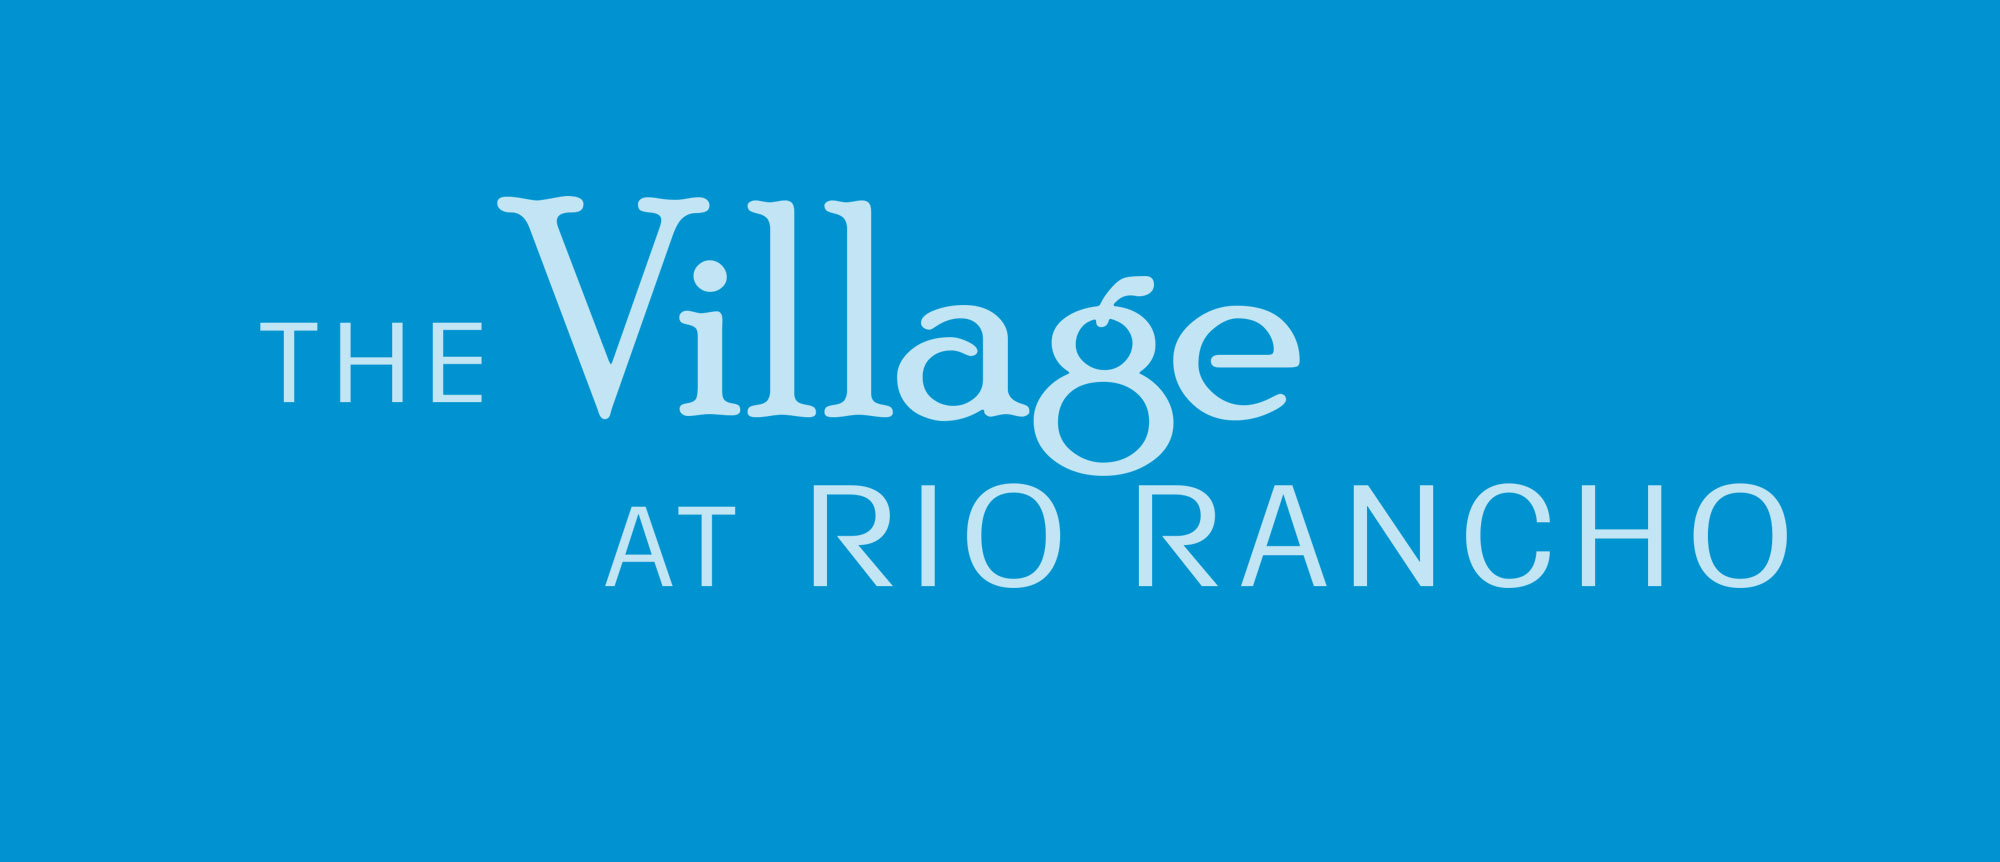 VillageatRioRancho_title